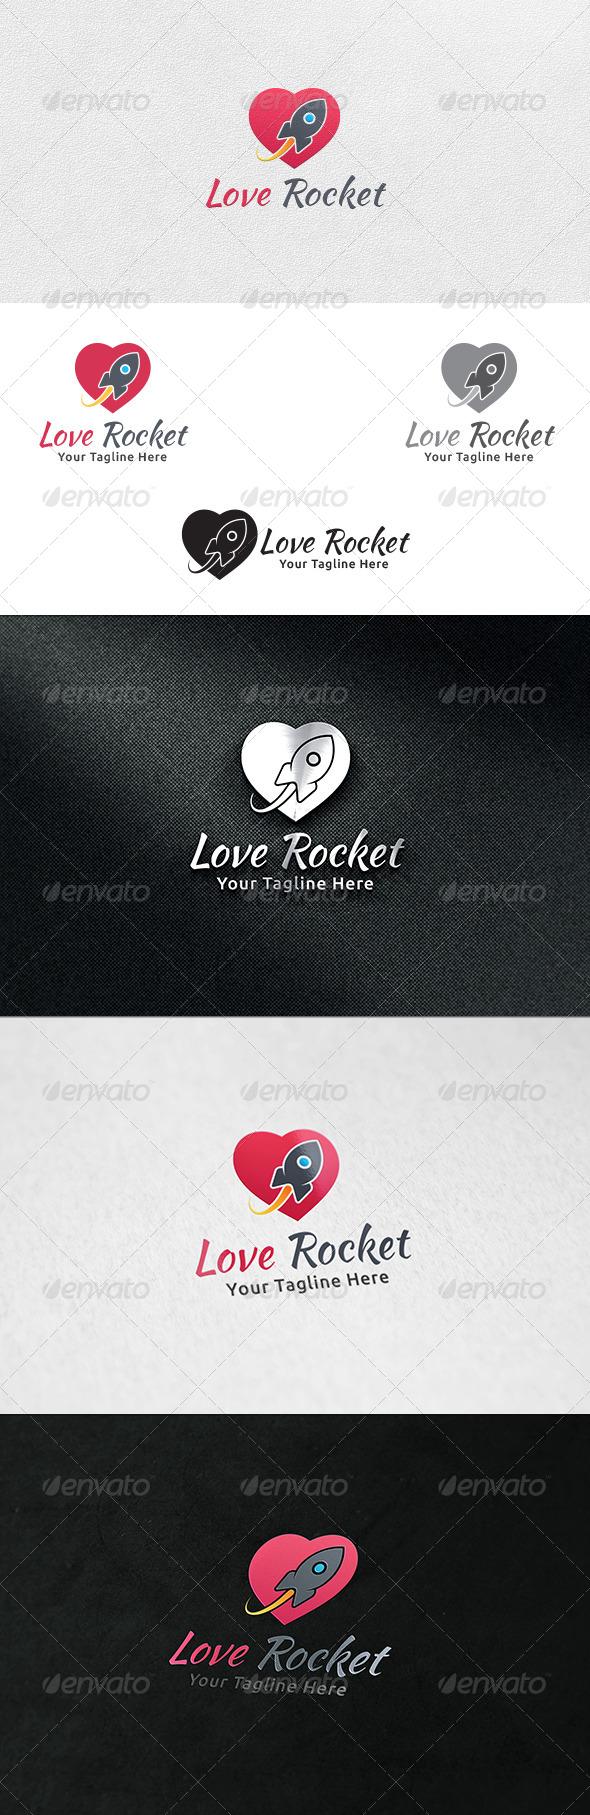 Love Rocket - Logo Template - Symbols Logo Templates